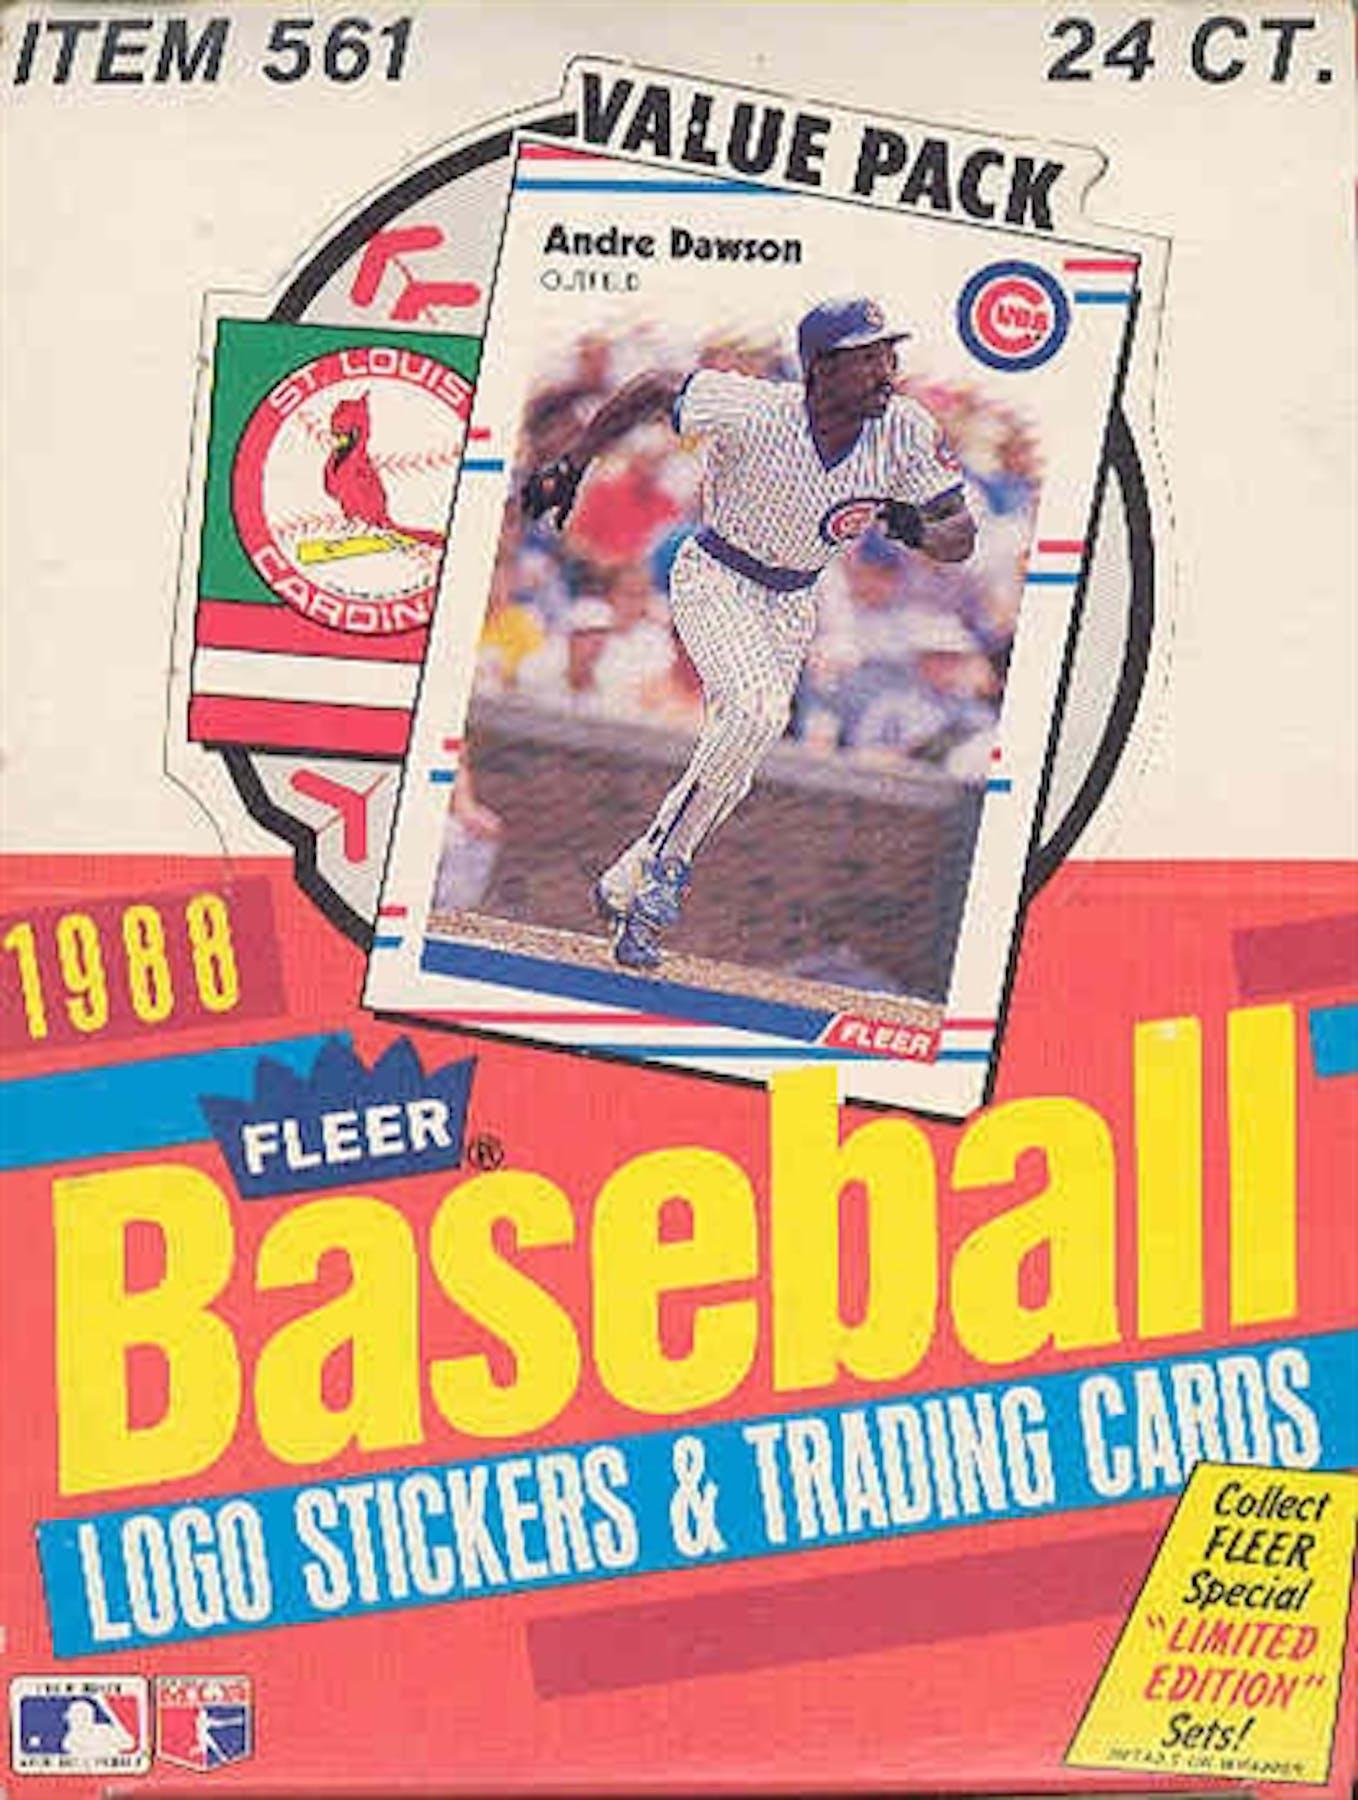 1988 Fleer Baseball Cello Box Da Card World